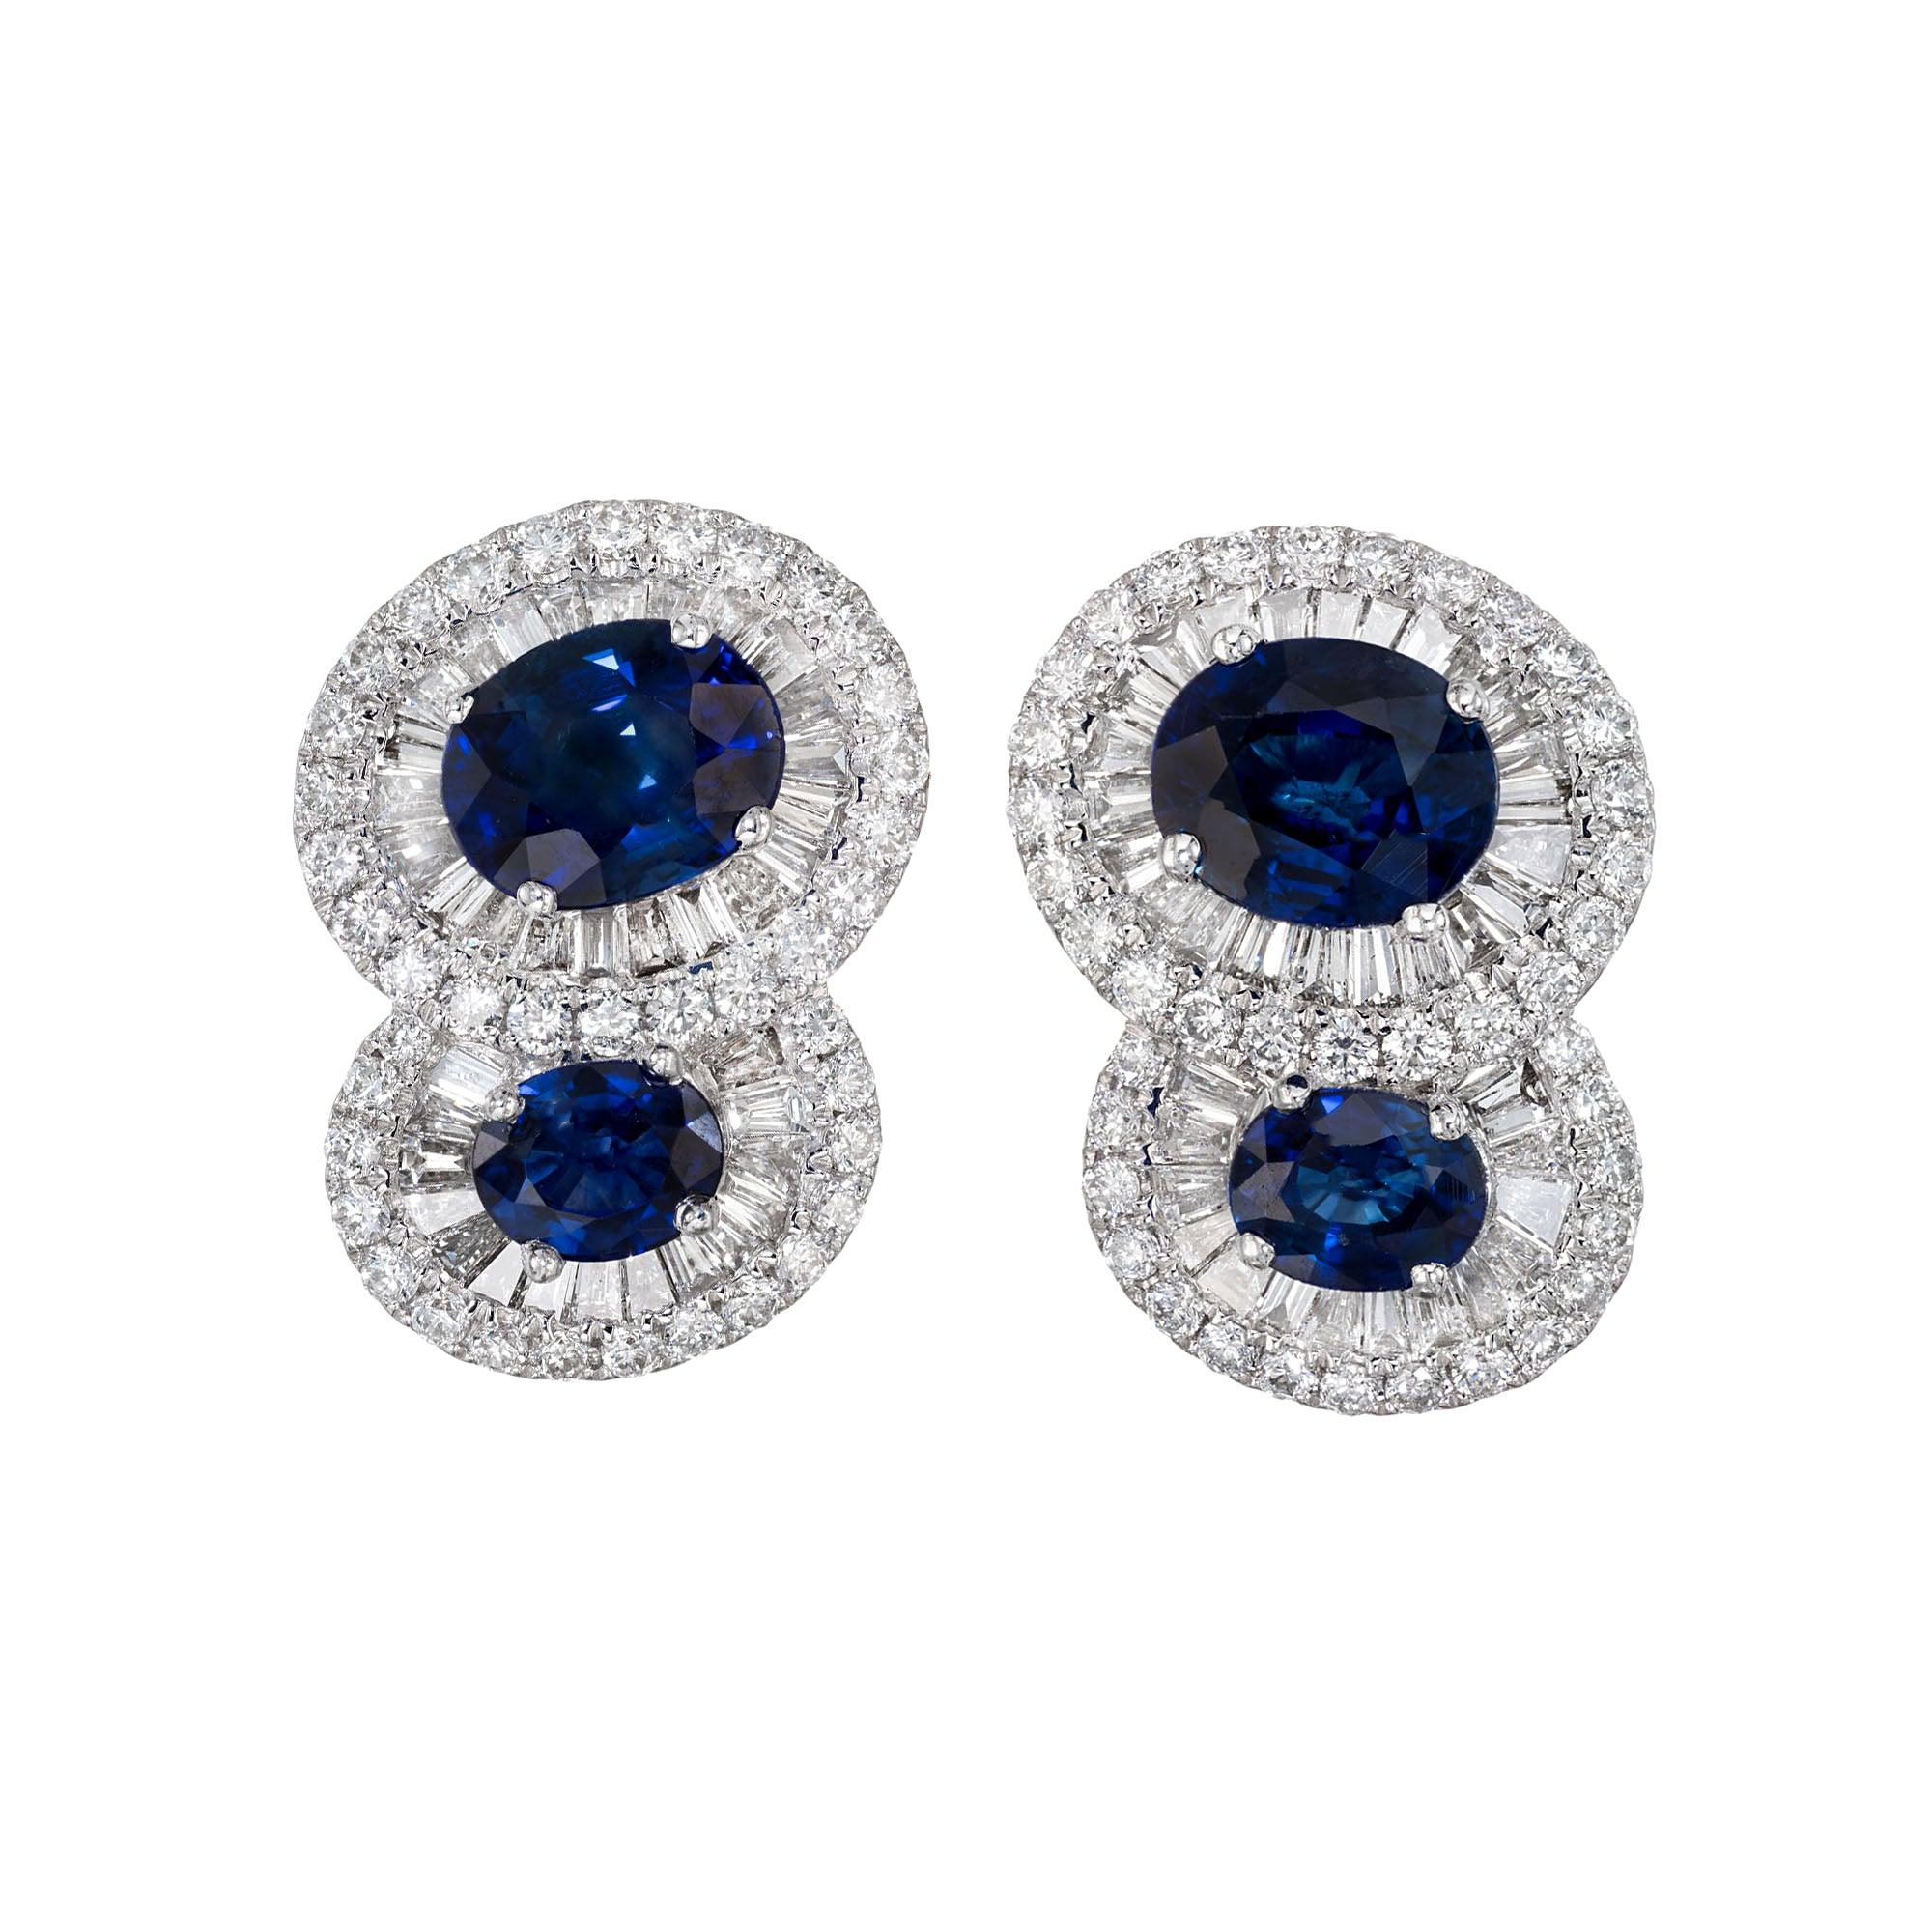 GIA Certified 2.43 Carat Royal Blue Sapphire Diamond Halo Gold Earrings